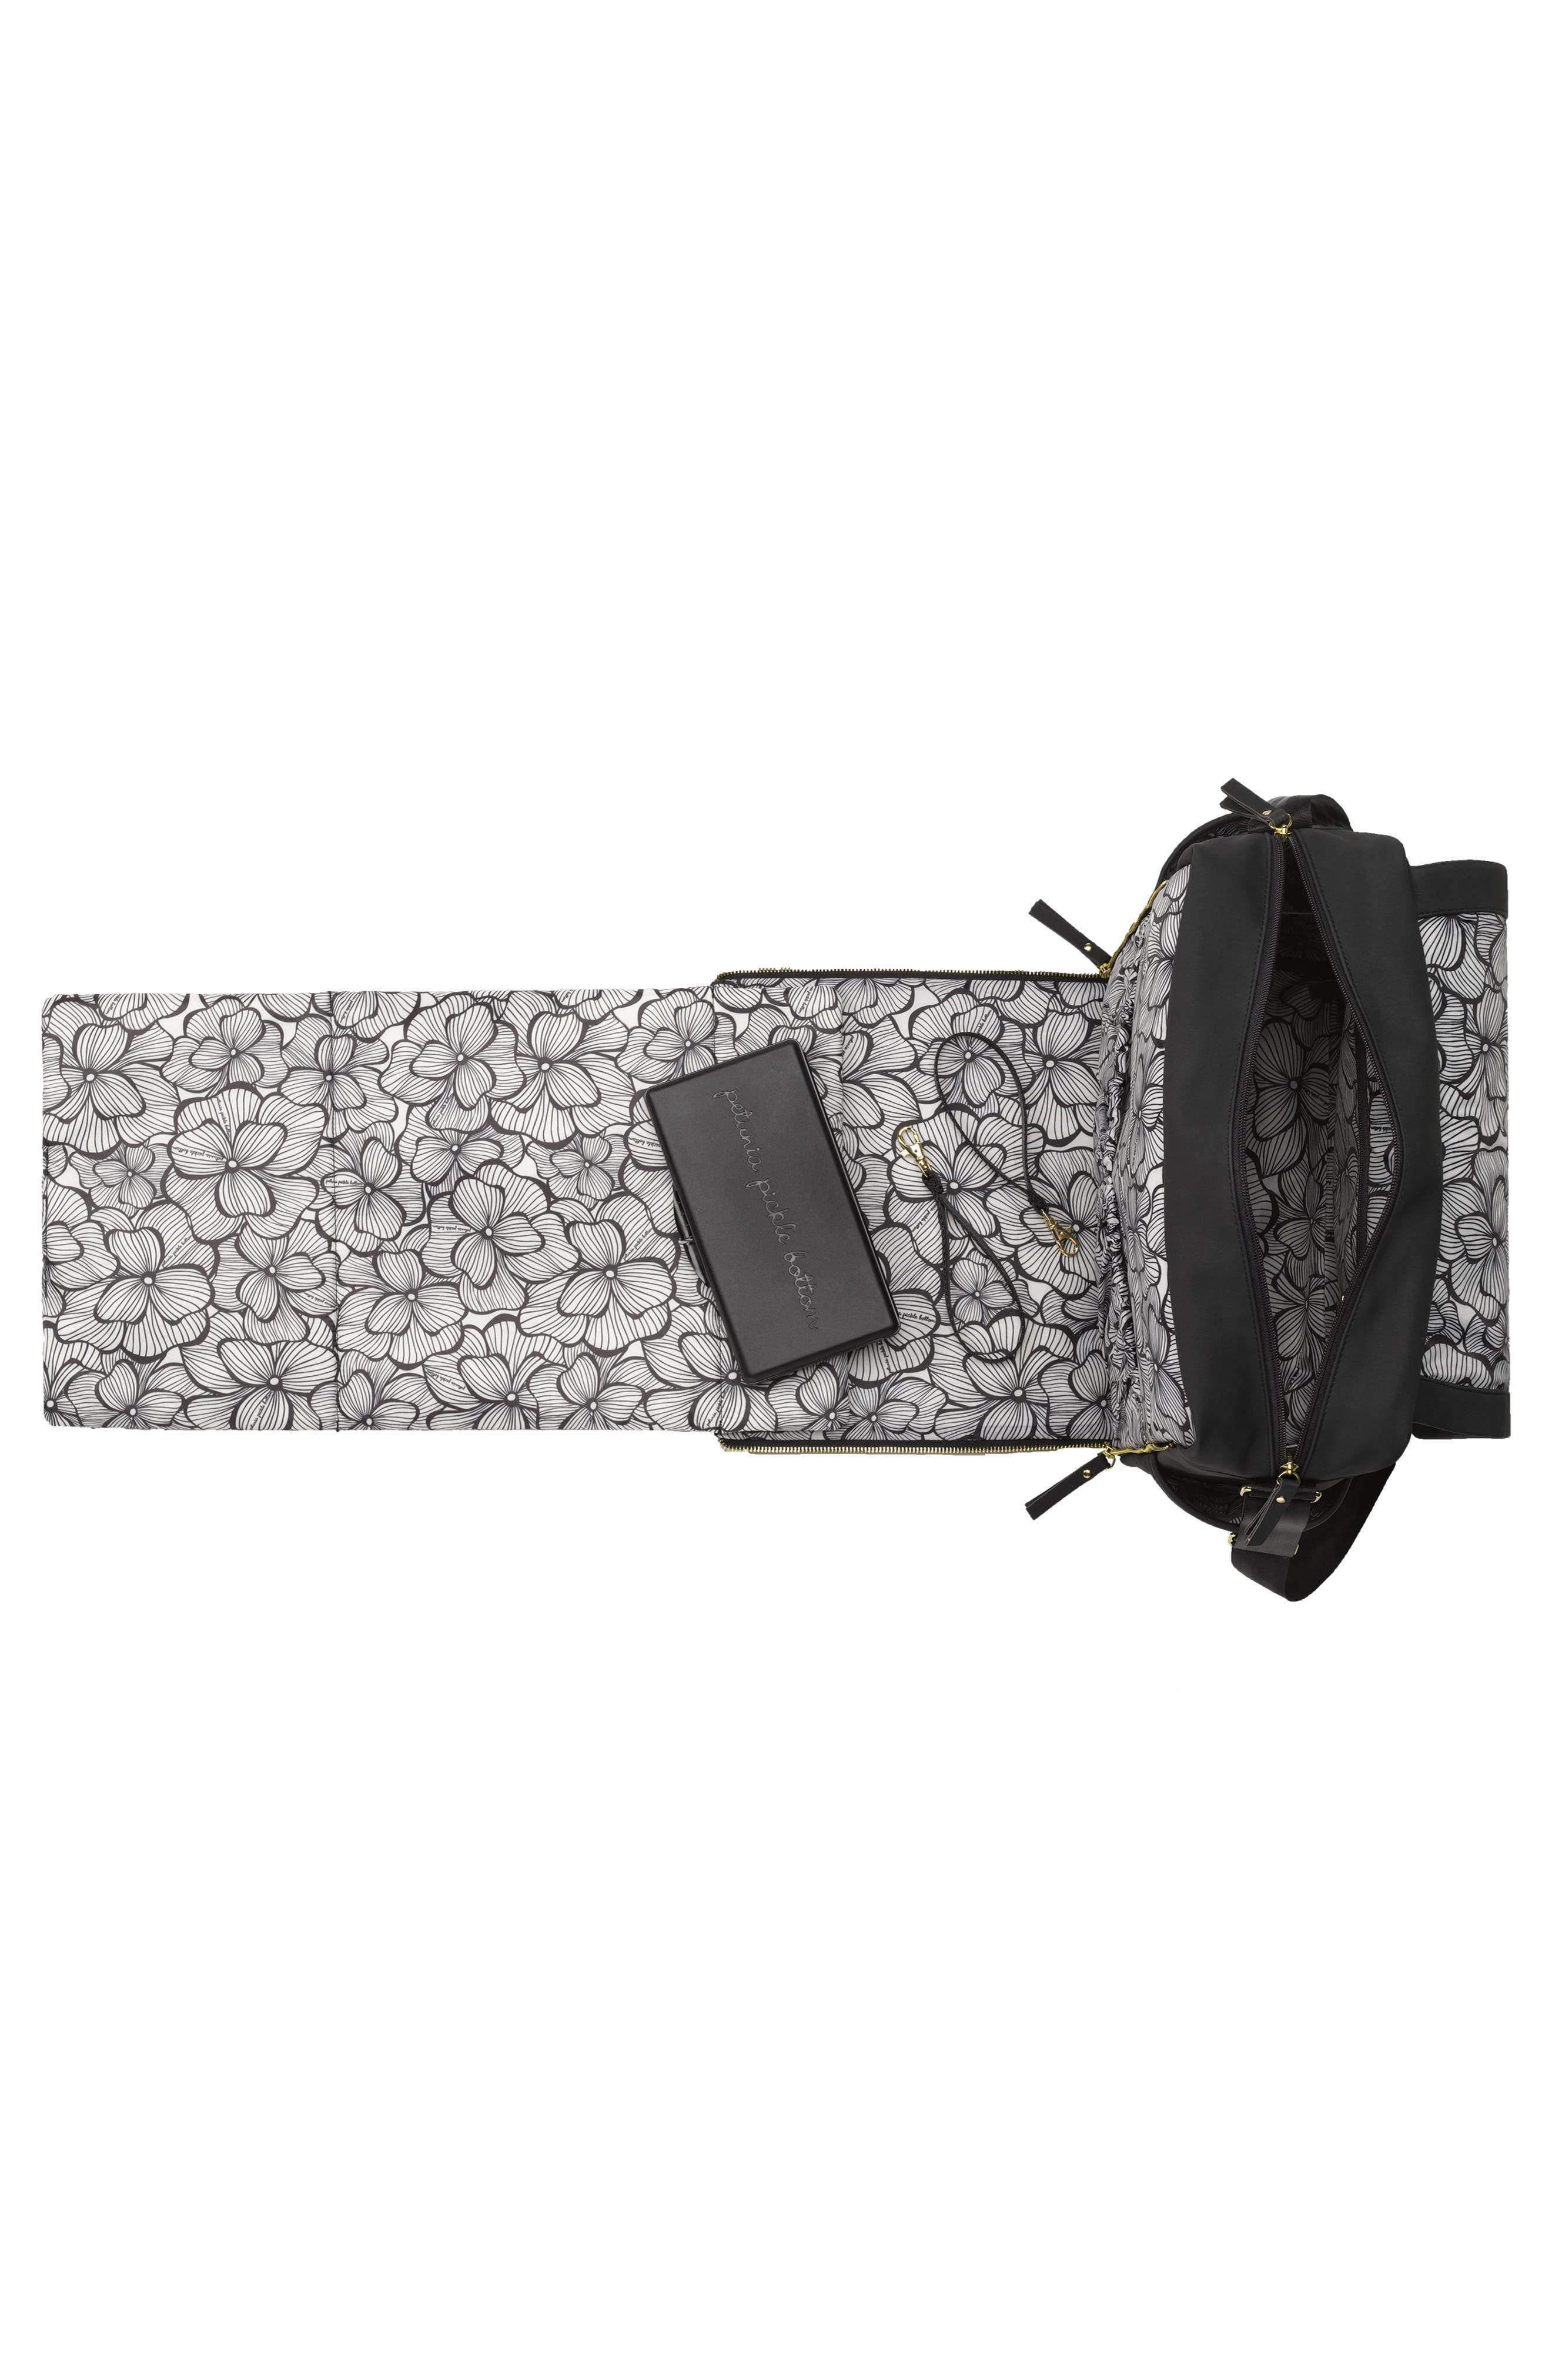 Boxy Backpack Diaper Bag,                             Alternate thumbnail 2, color,                             BLACK MATTE LEATHERETTE